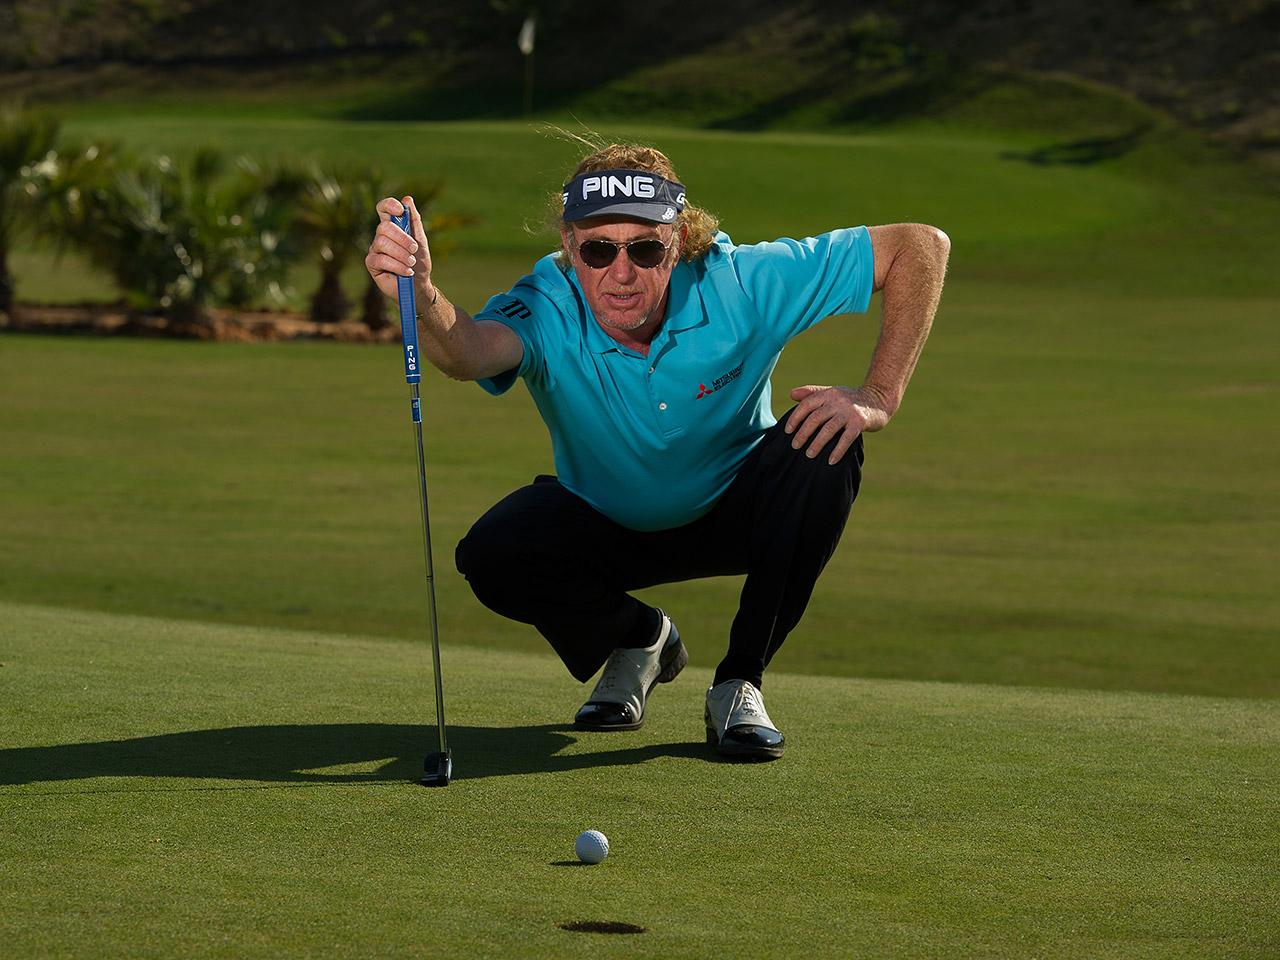 Miguel Angel Jimenez Golf Academy, Malaga